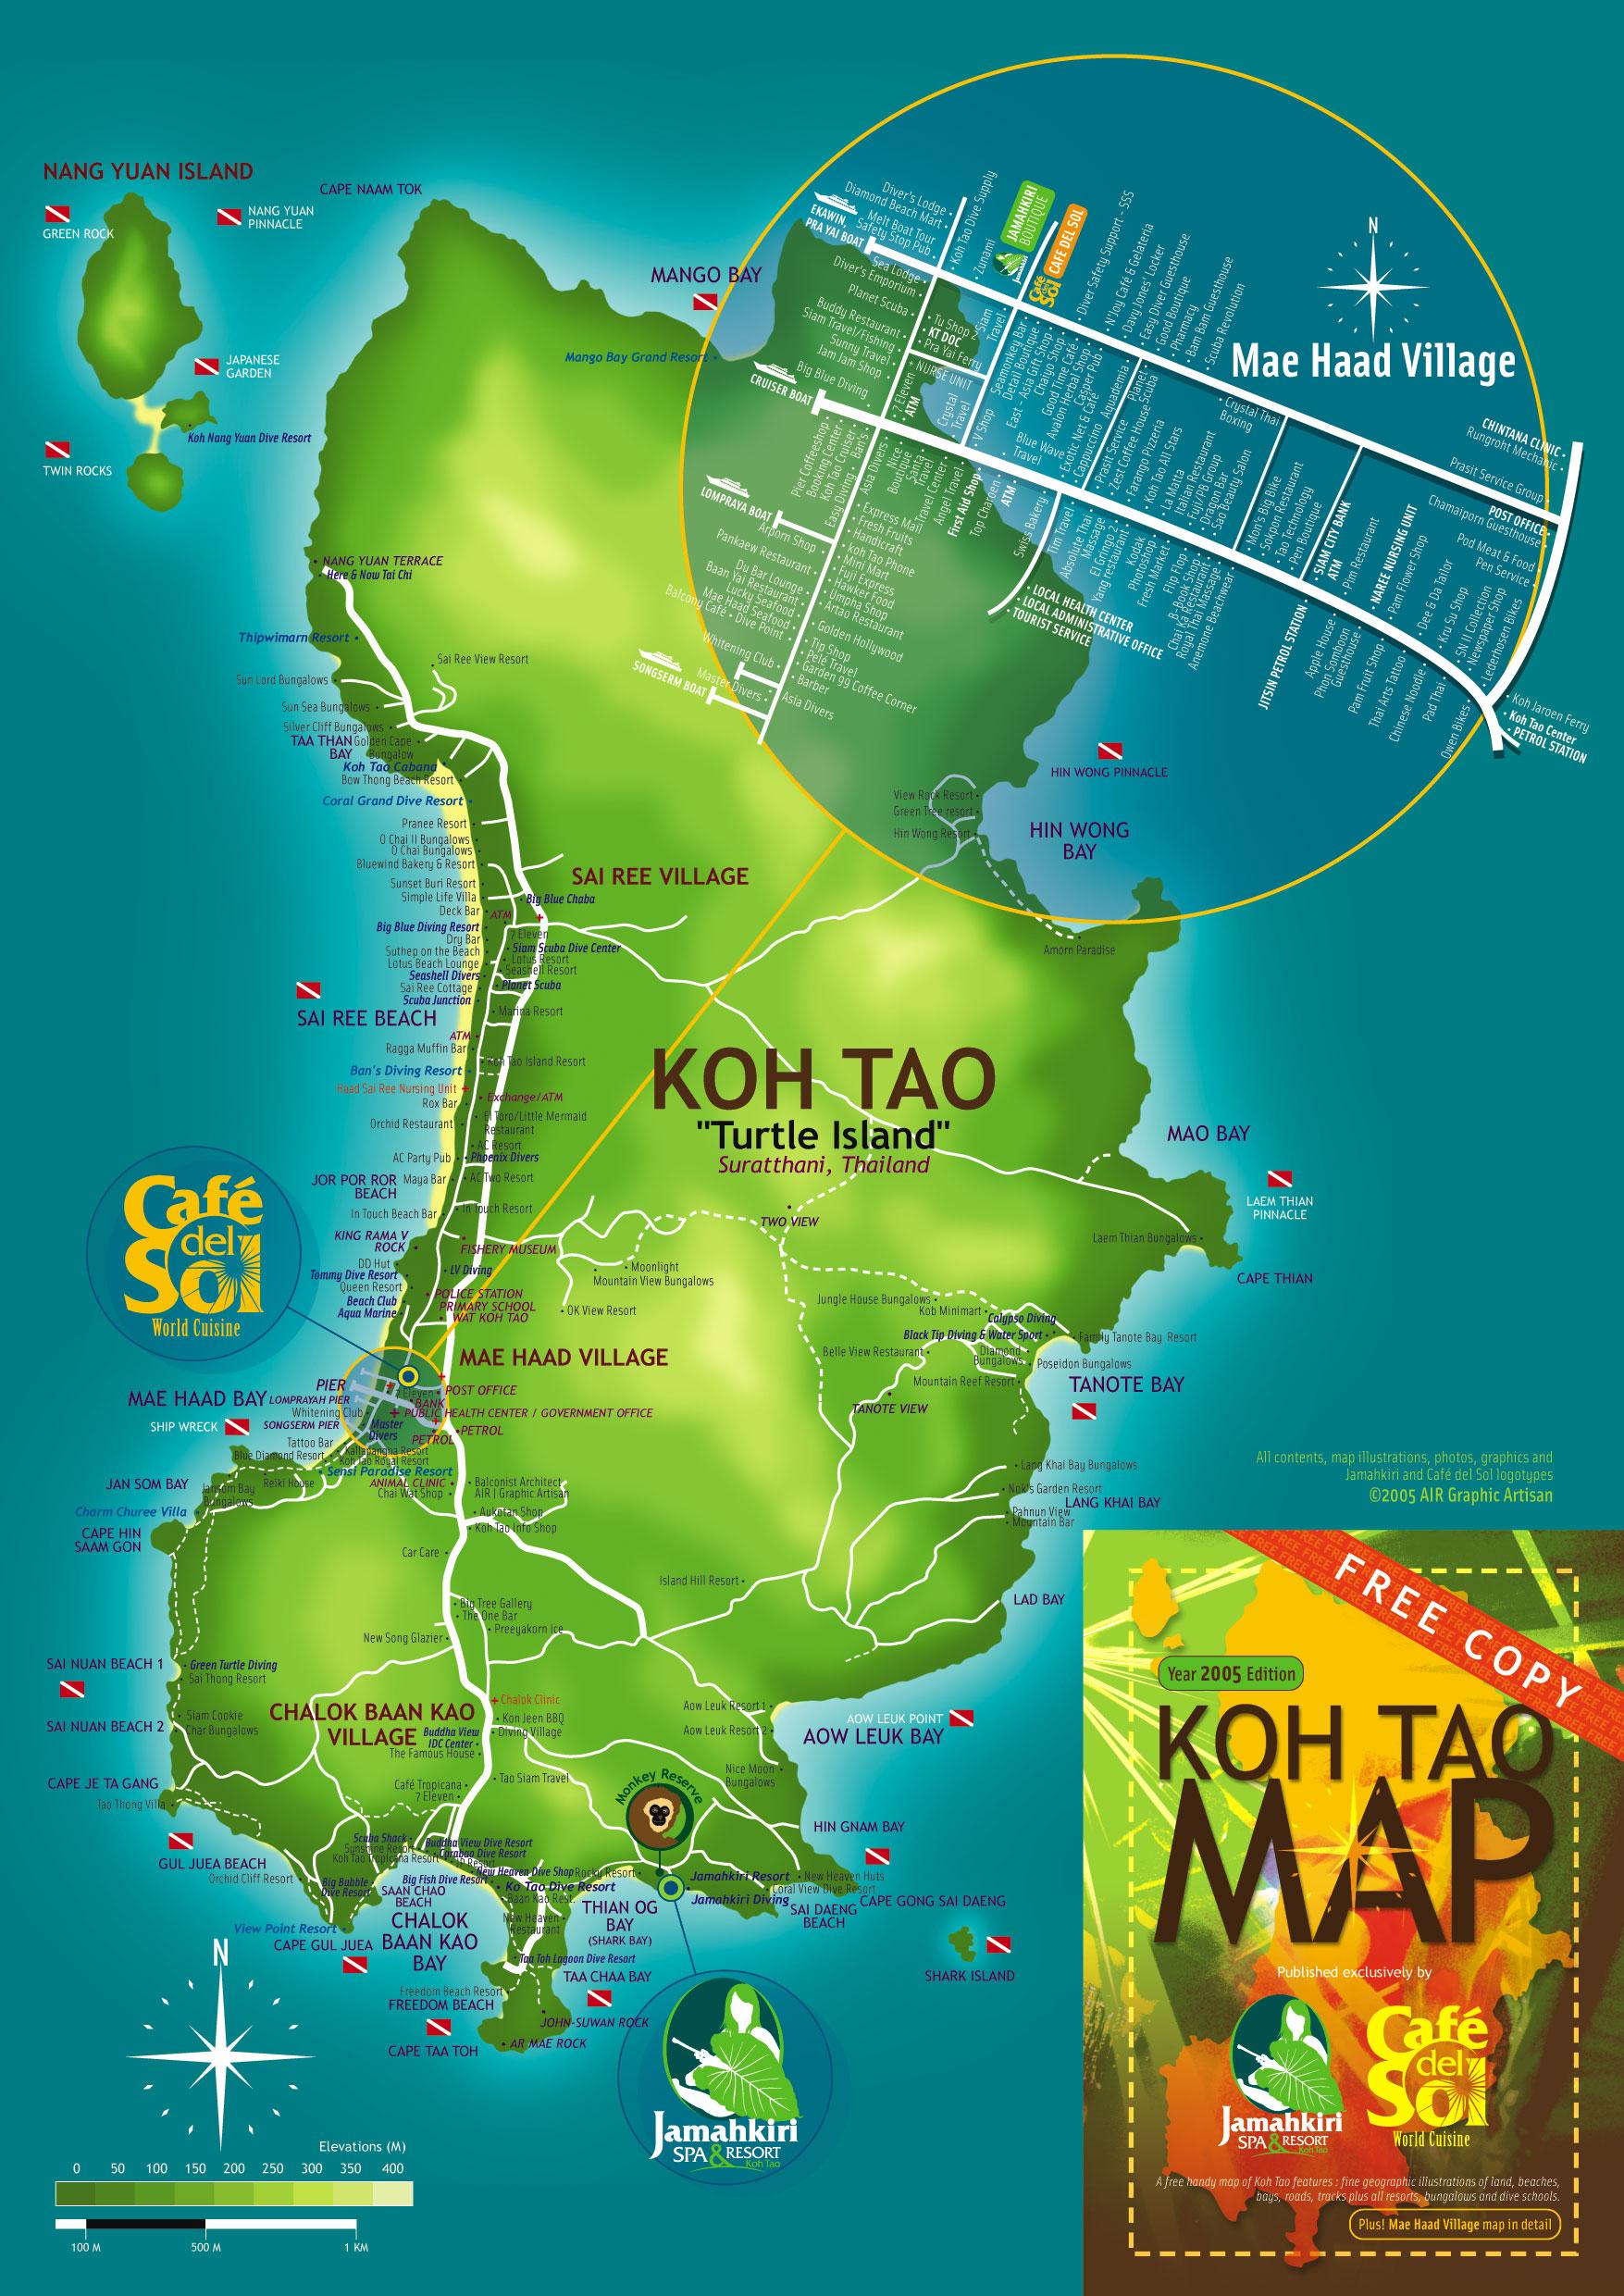 Koh Tao Tourist Map Koh Tao Thailand mappery